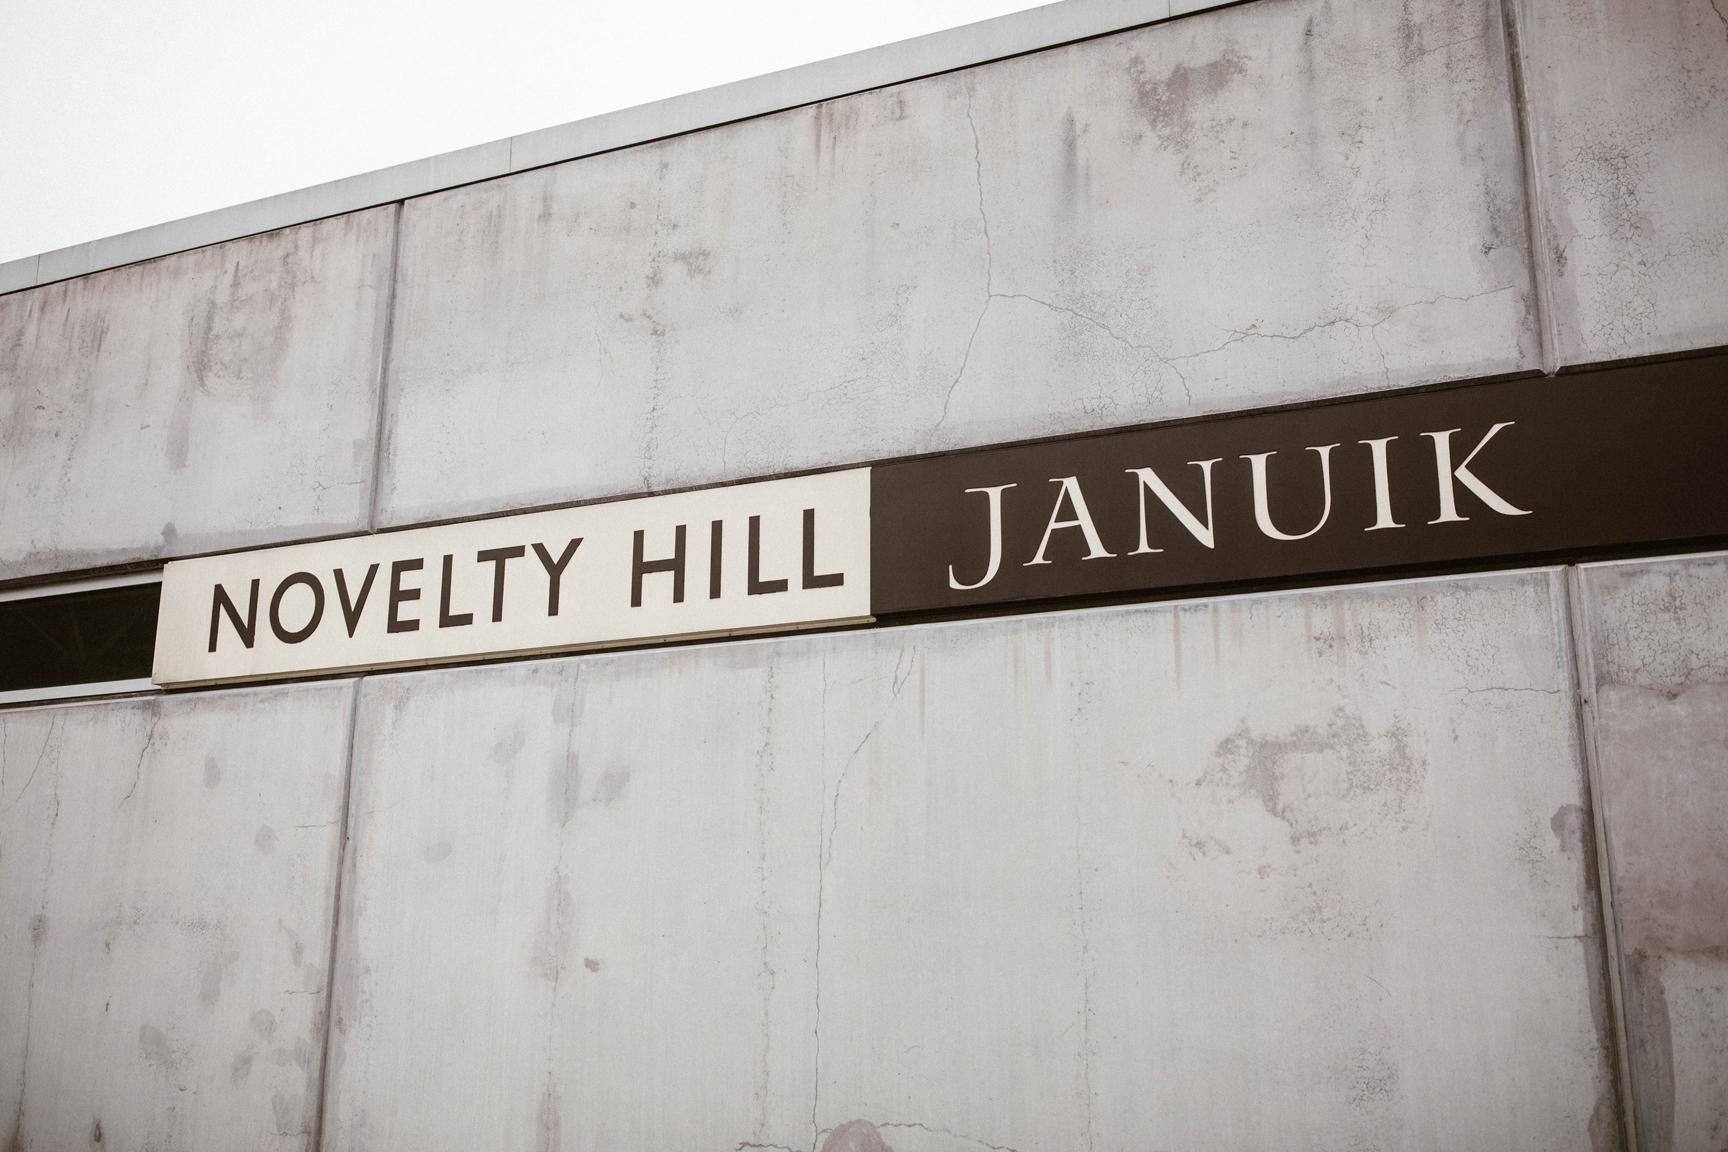 Novelty Hill - Jannuik Winery, Woodinville by Seattle wedding photographer adina preston